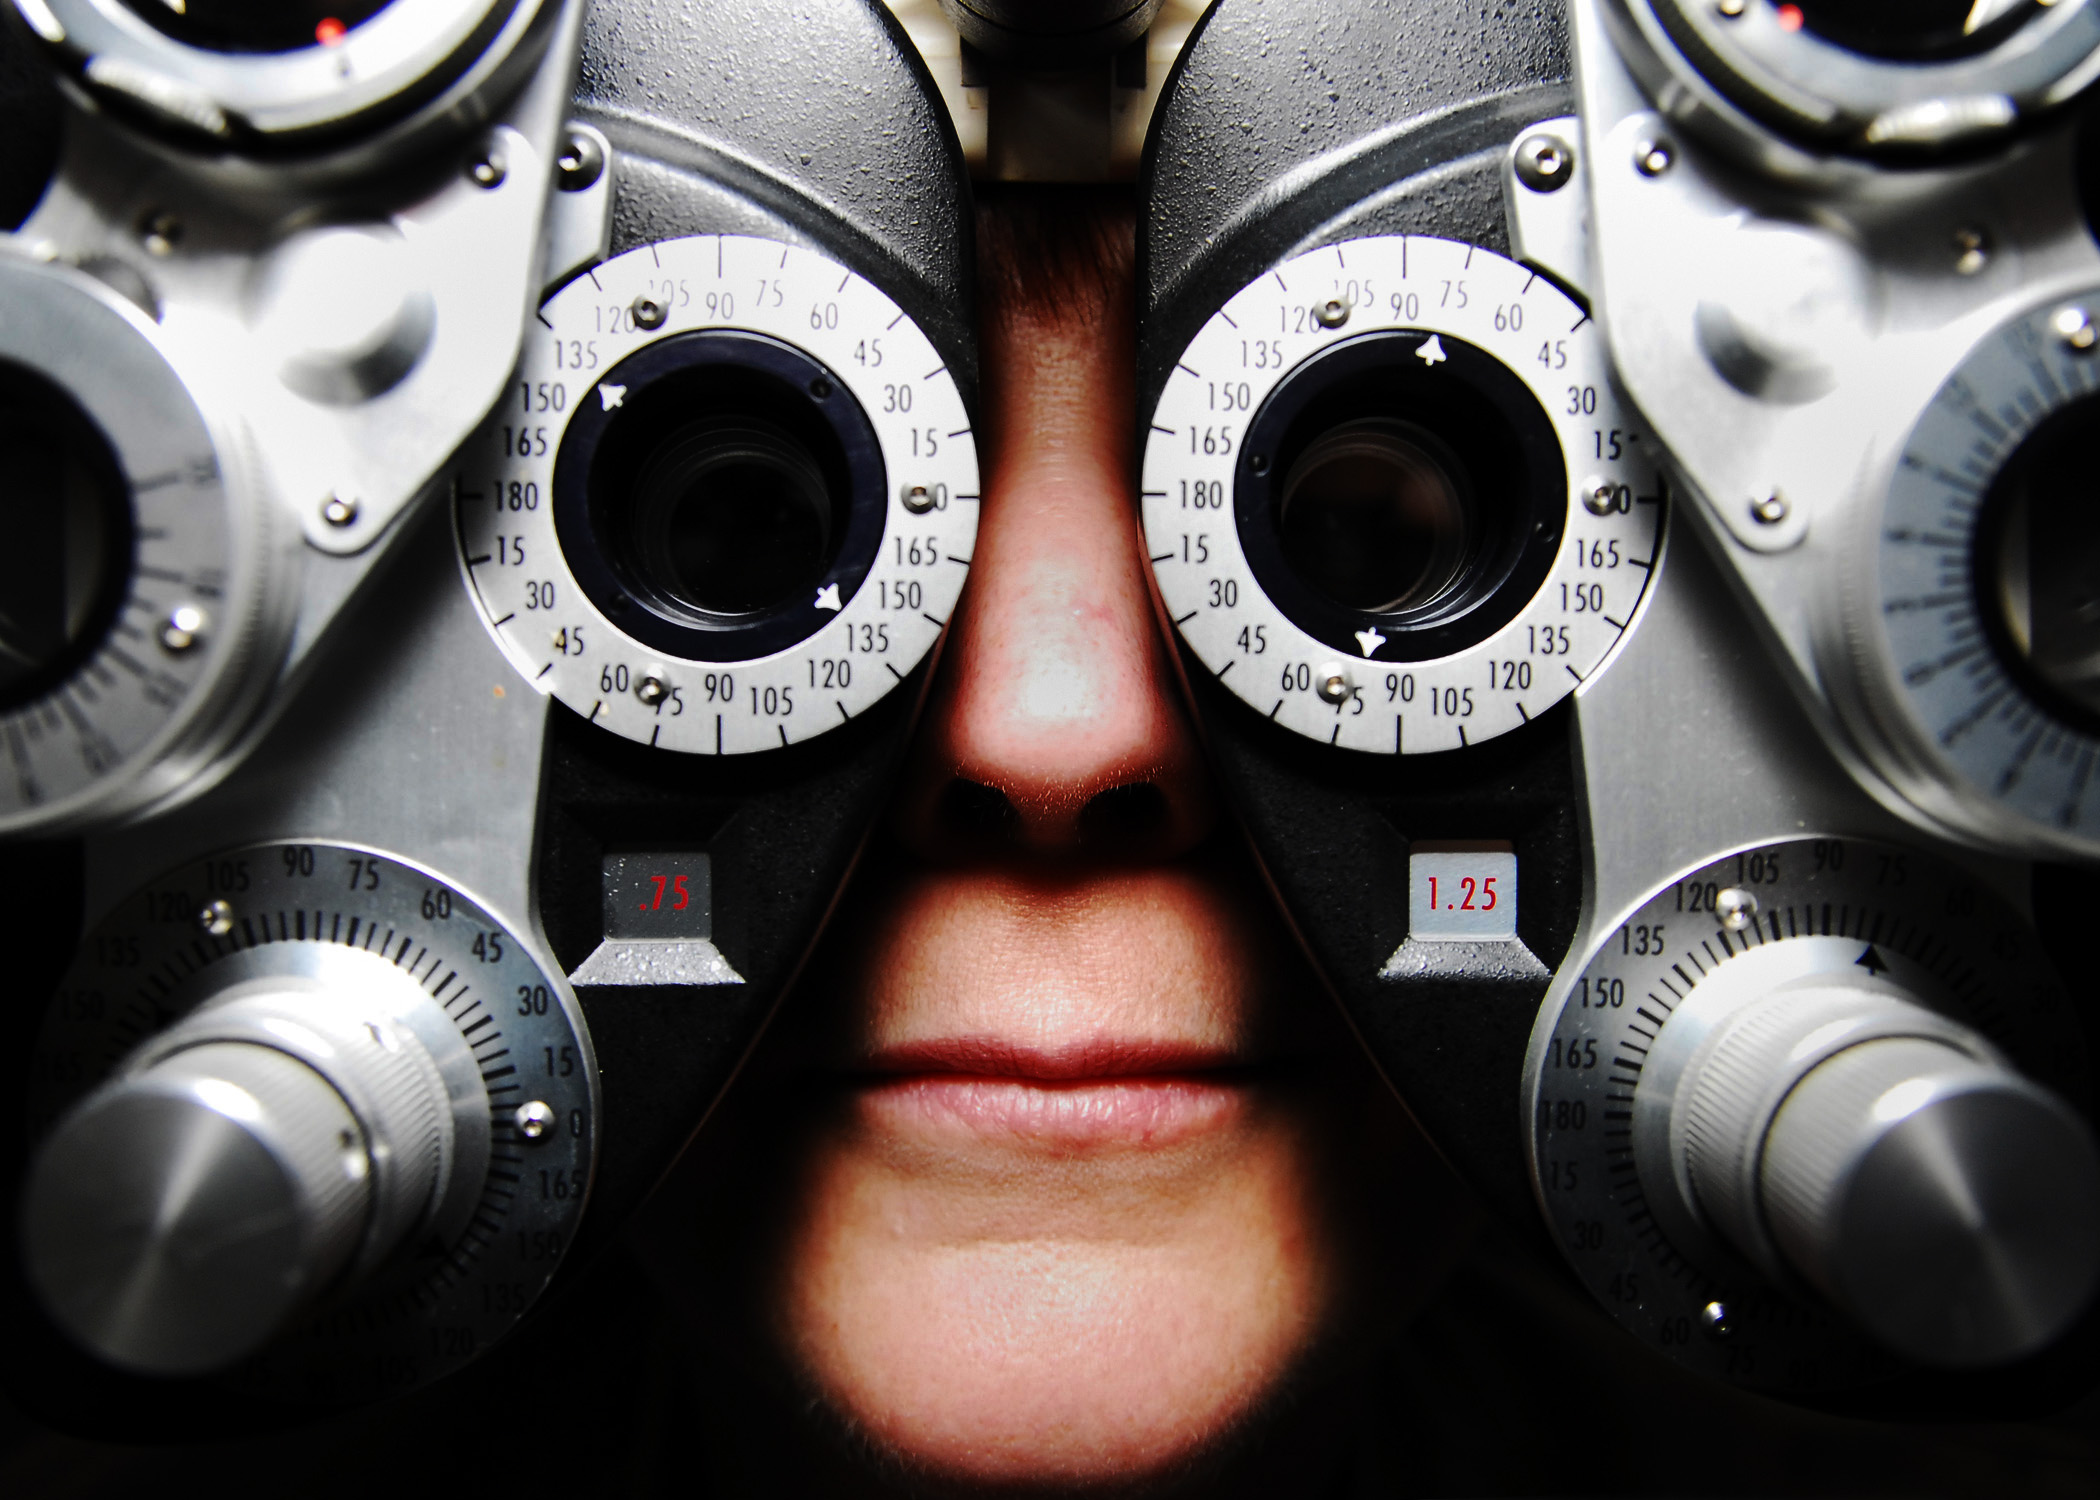 Depiction of Optometrista